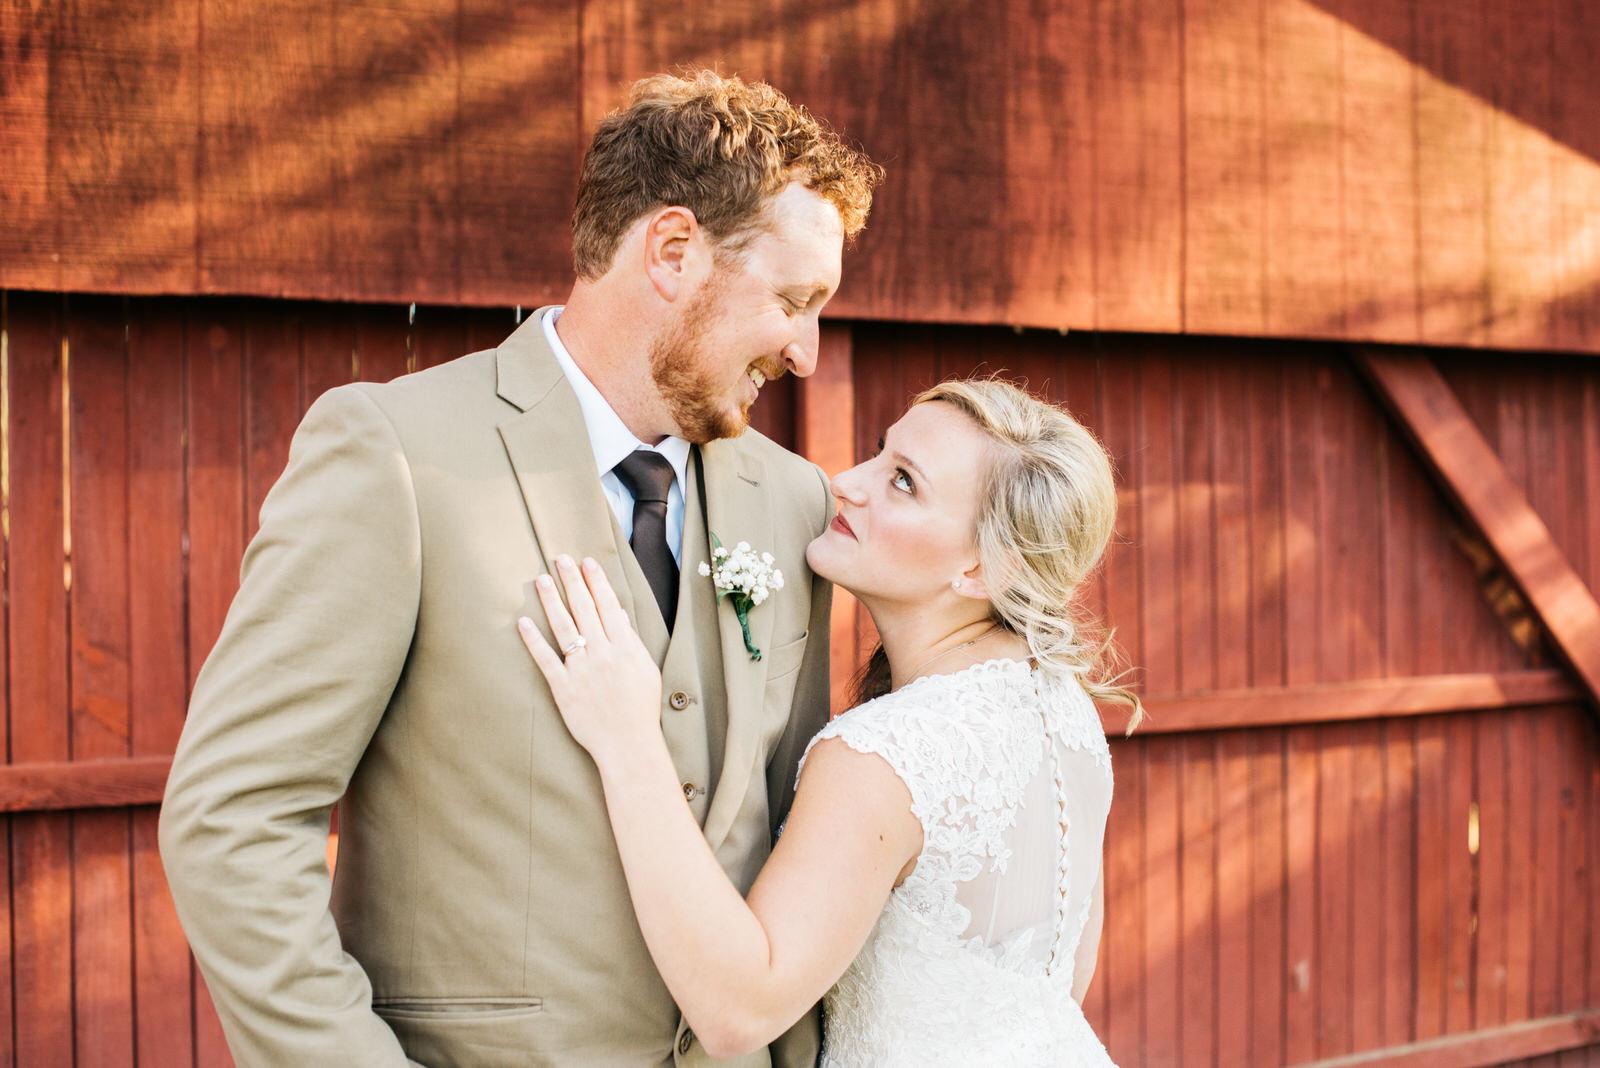 wedding_at_red_fox_winery_wedding_photographer061.jpg